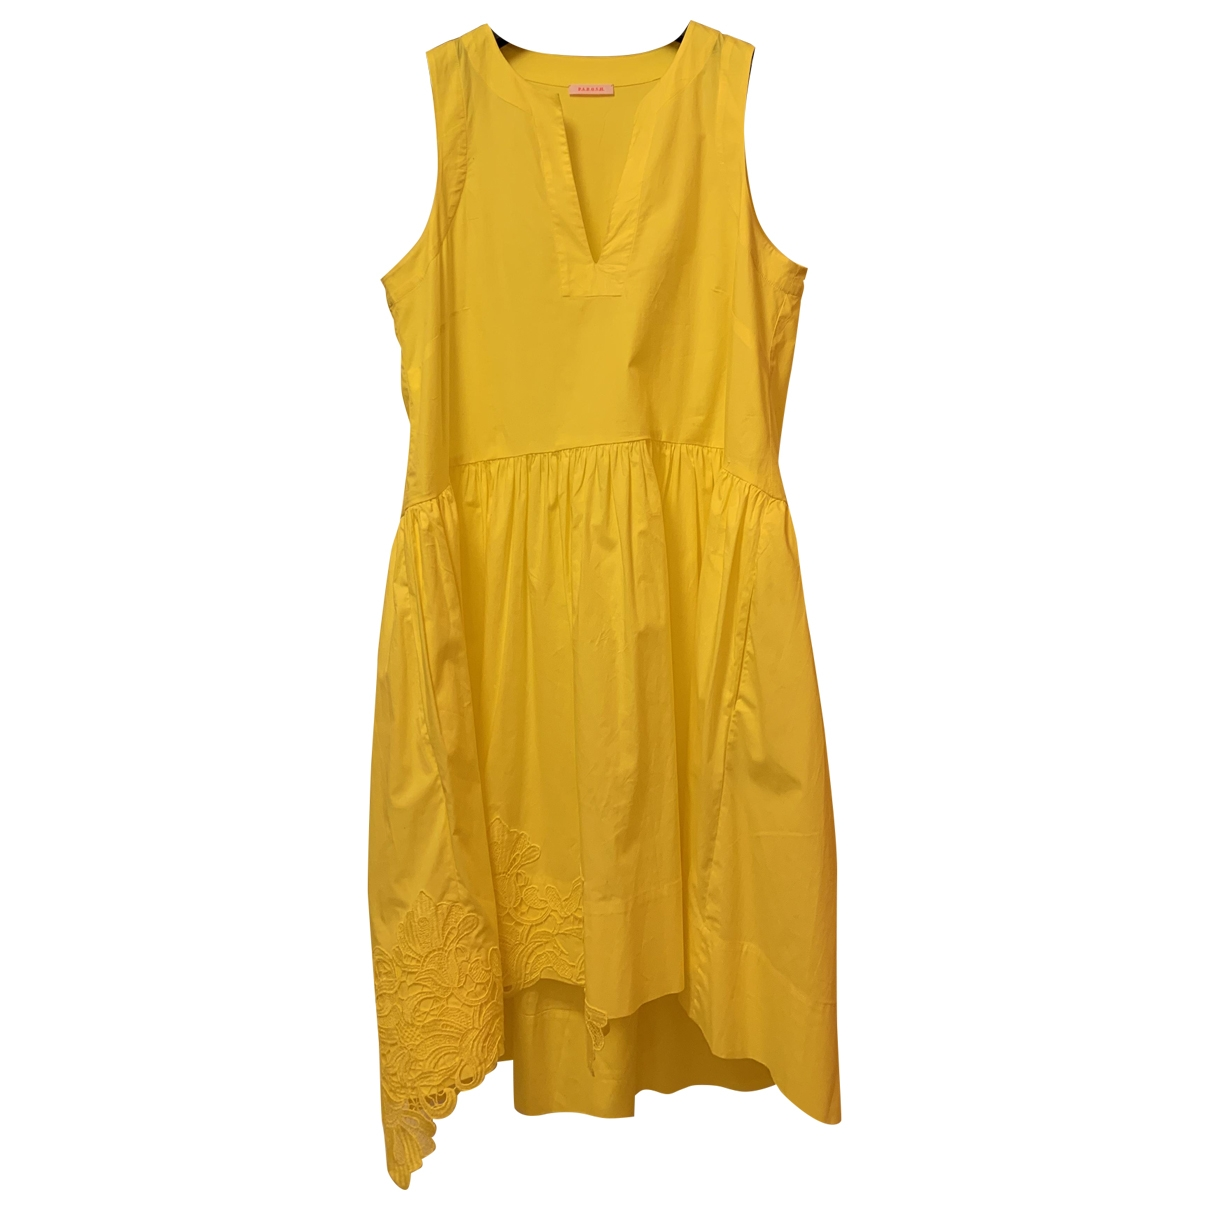 Parosh \N Yellow Cotton dress for Women M International